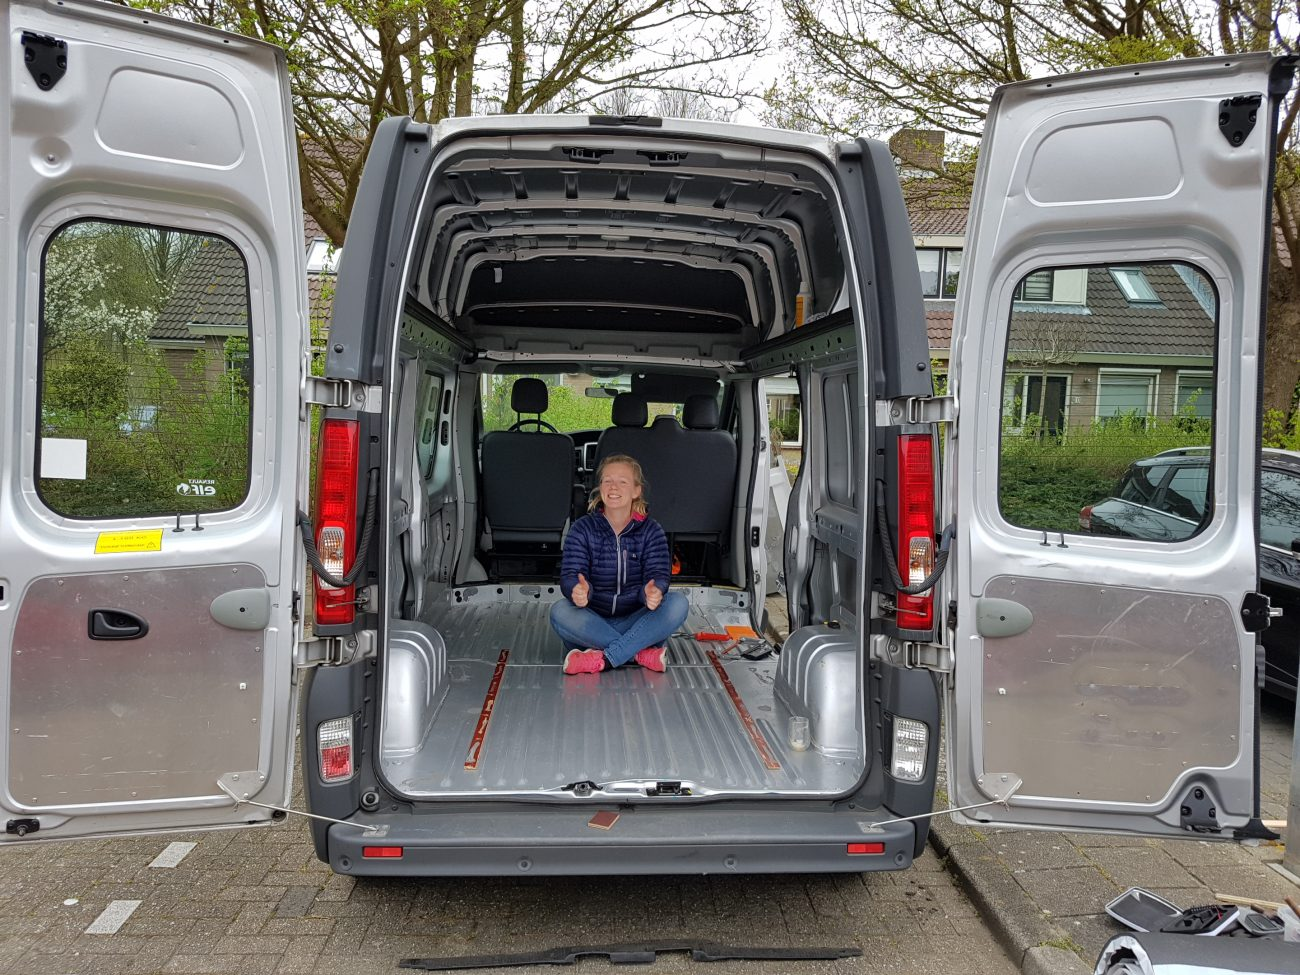 Stripping the Van – DIY Renault Trafic CamperVan Conversion Part 1